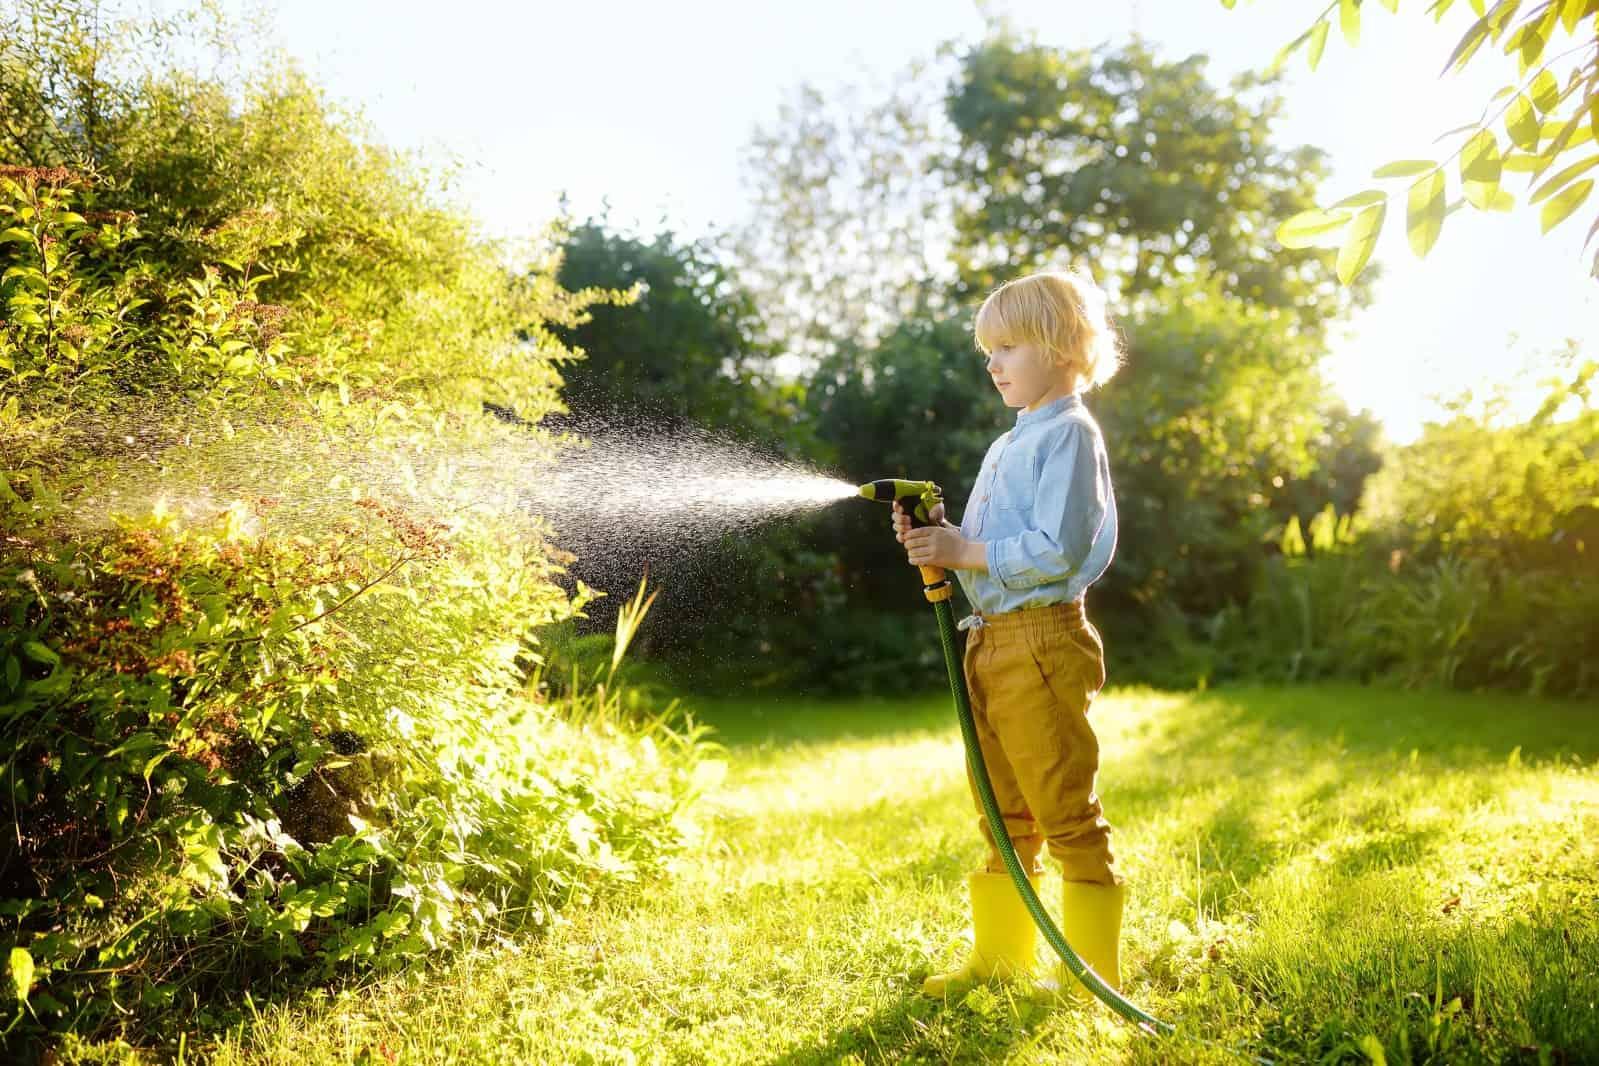 hose-play-backyard-kid-garden-water-having-fun-fun-summer-sprinkler-boy-child-watering-plant-sun_t20_E0KVBK